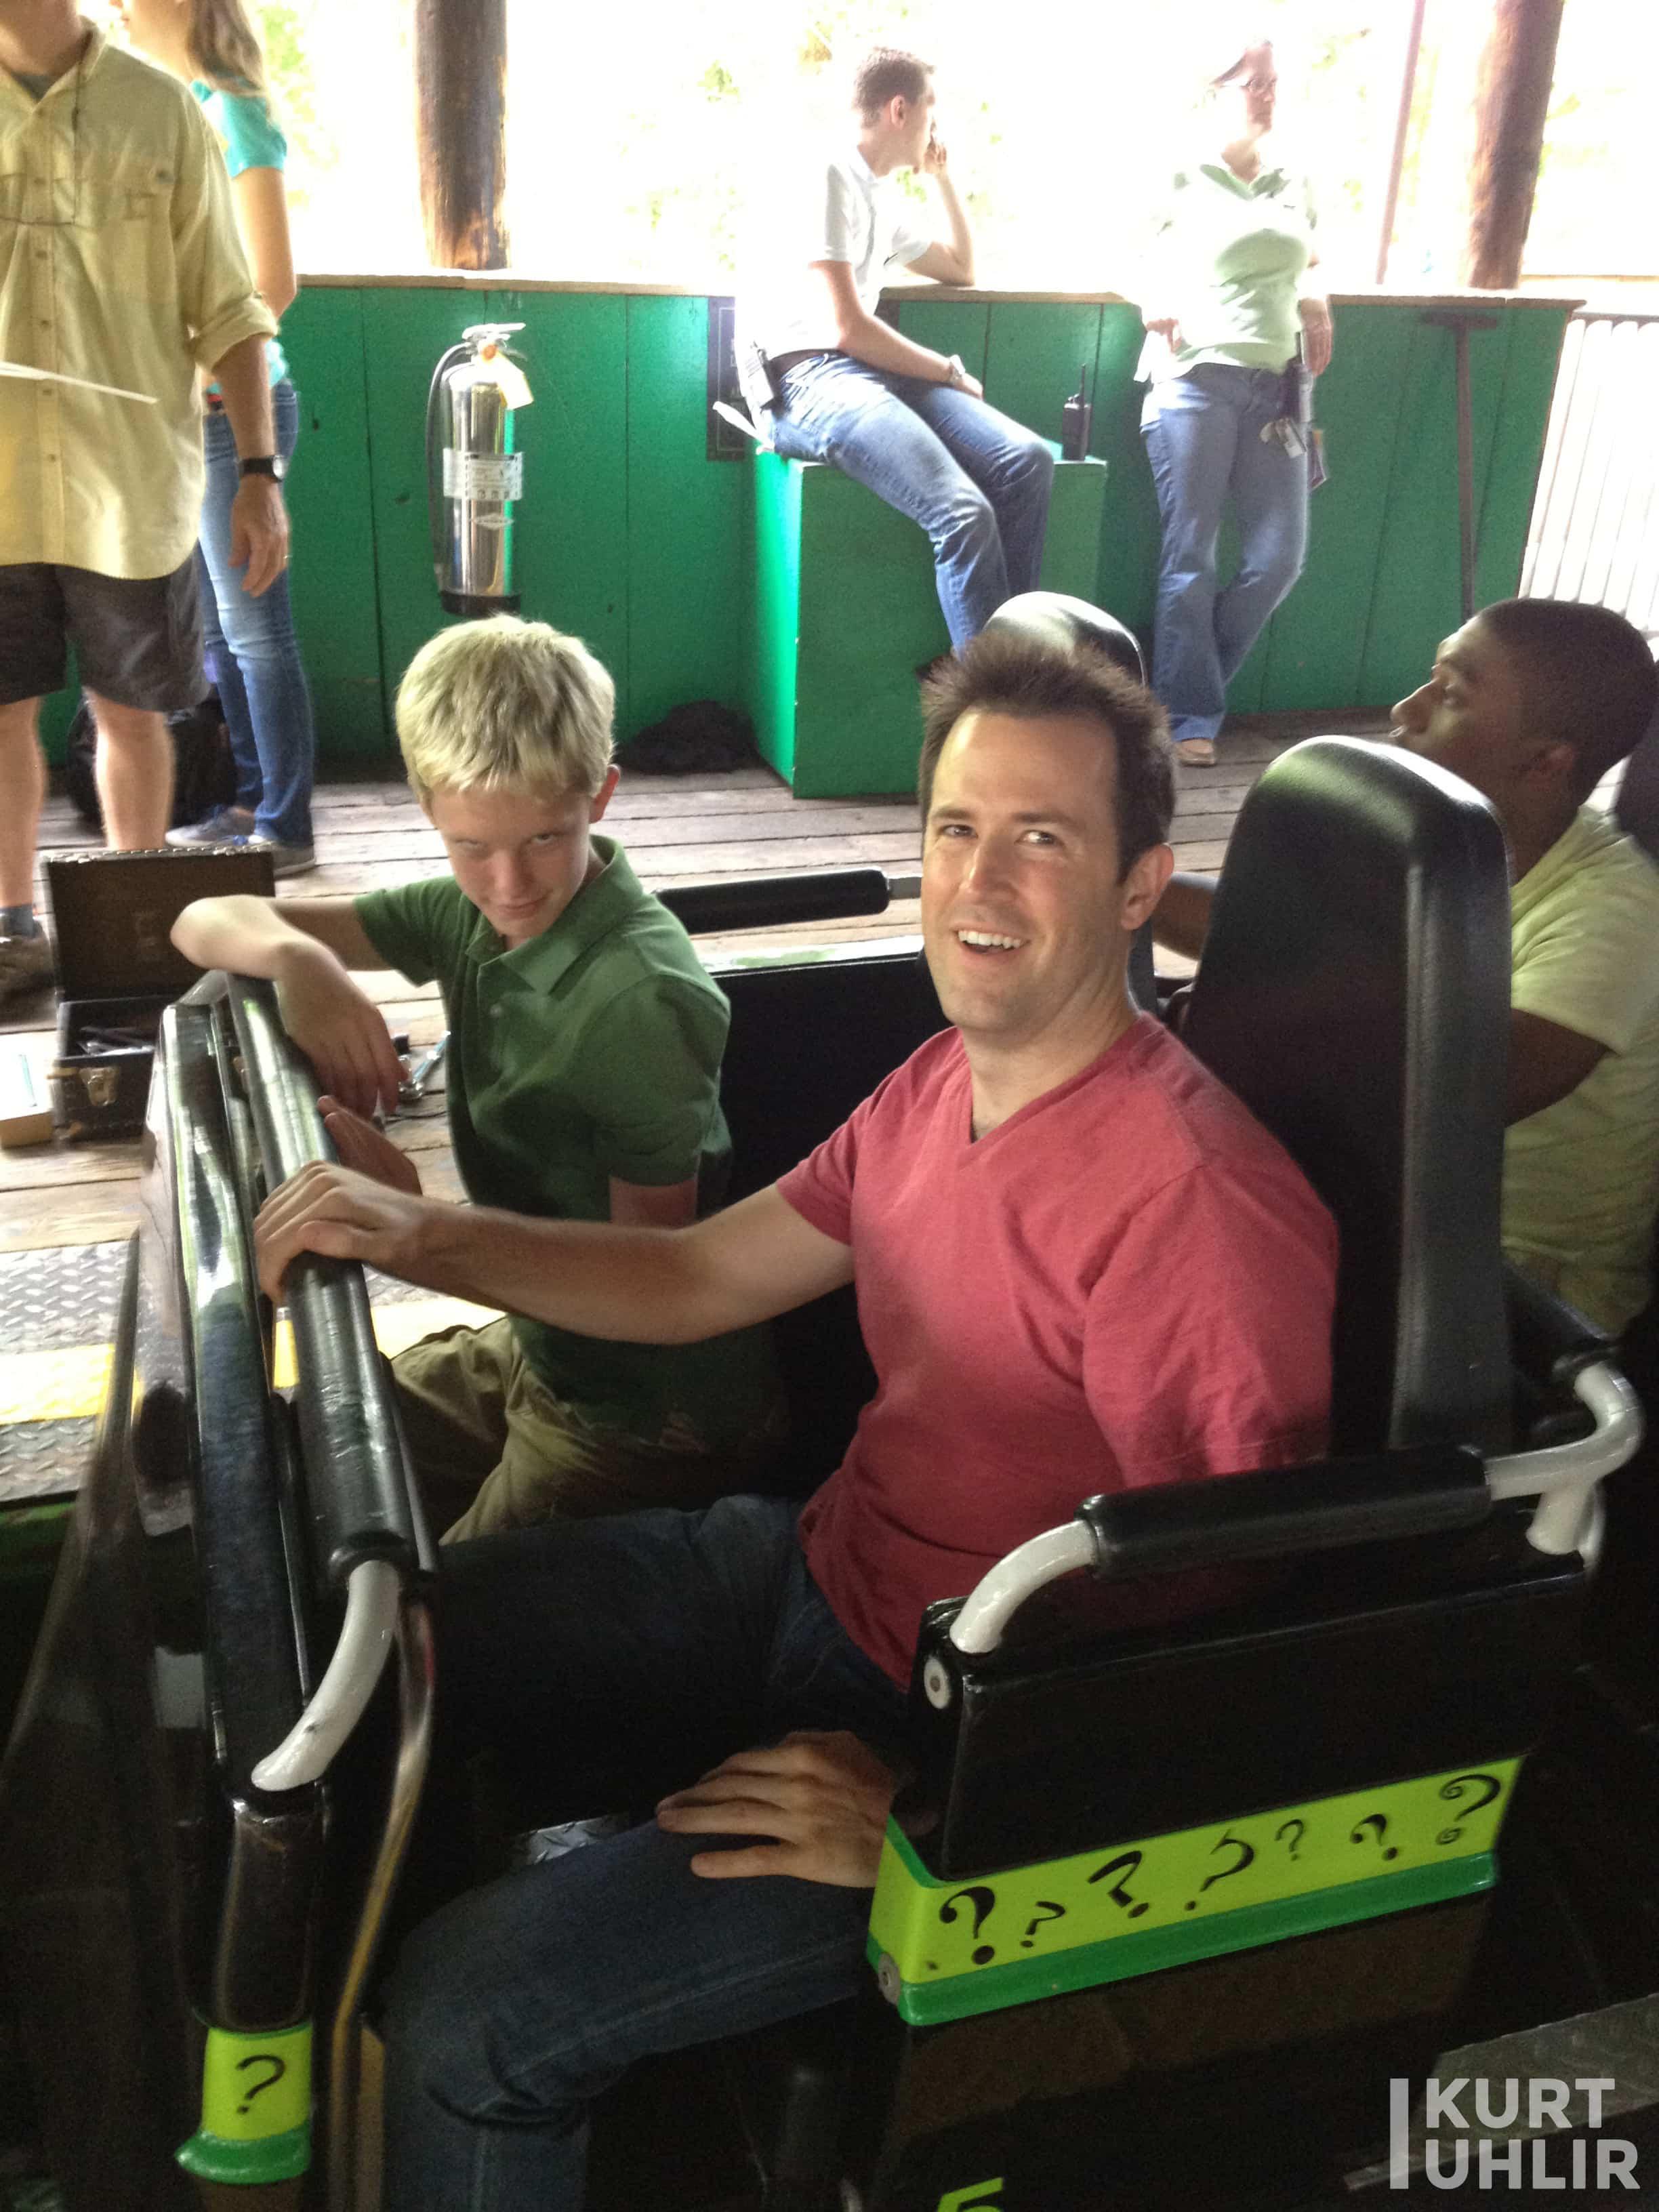 Kurt Uhlir behind the scenes at Six Flags photo shoot